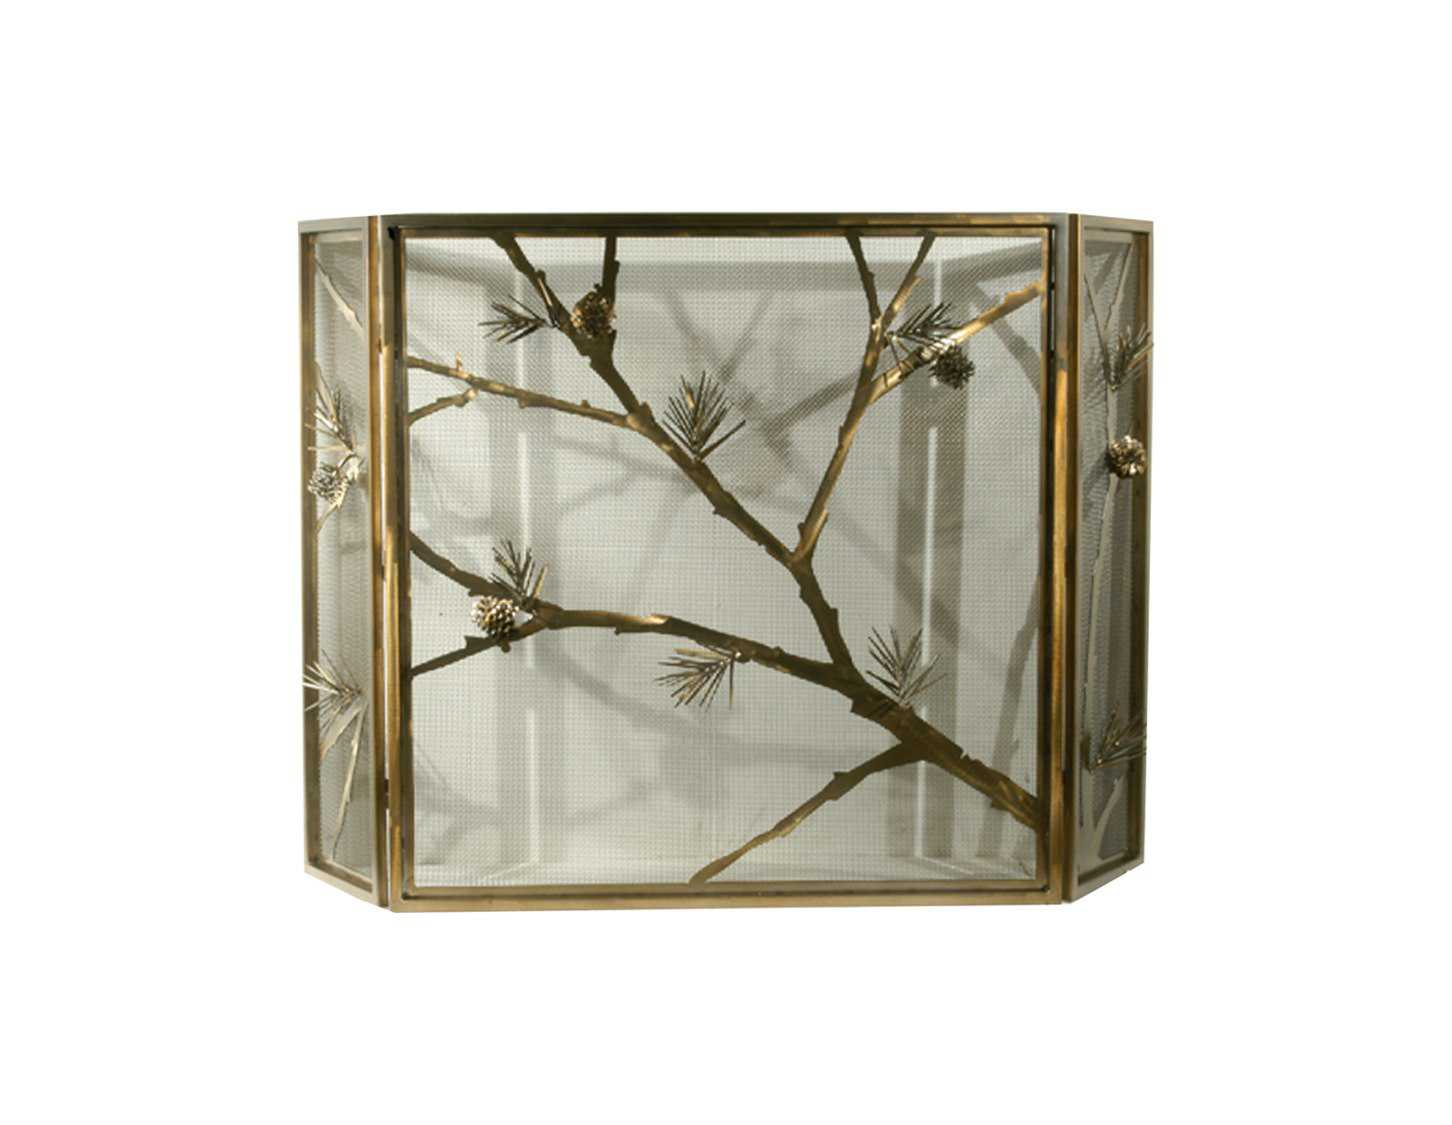 Meyda Tiffany Lone Pine Folding Fireplace Screen 71075